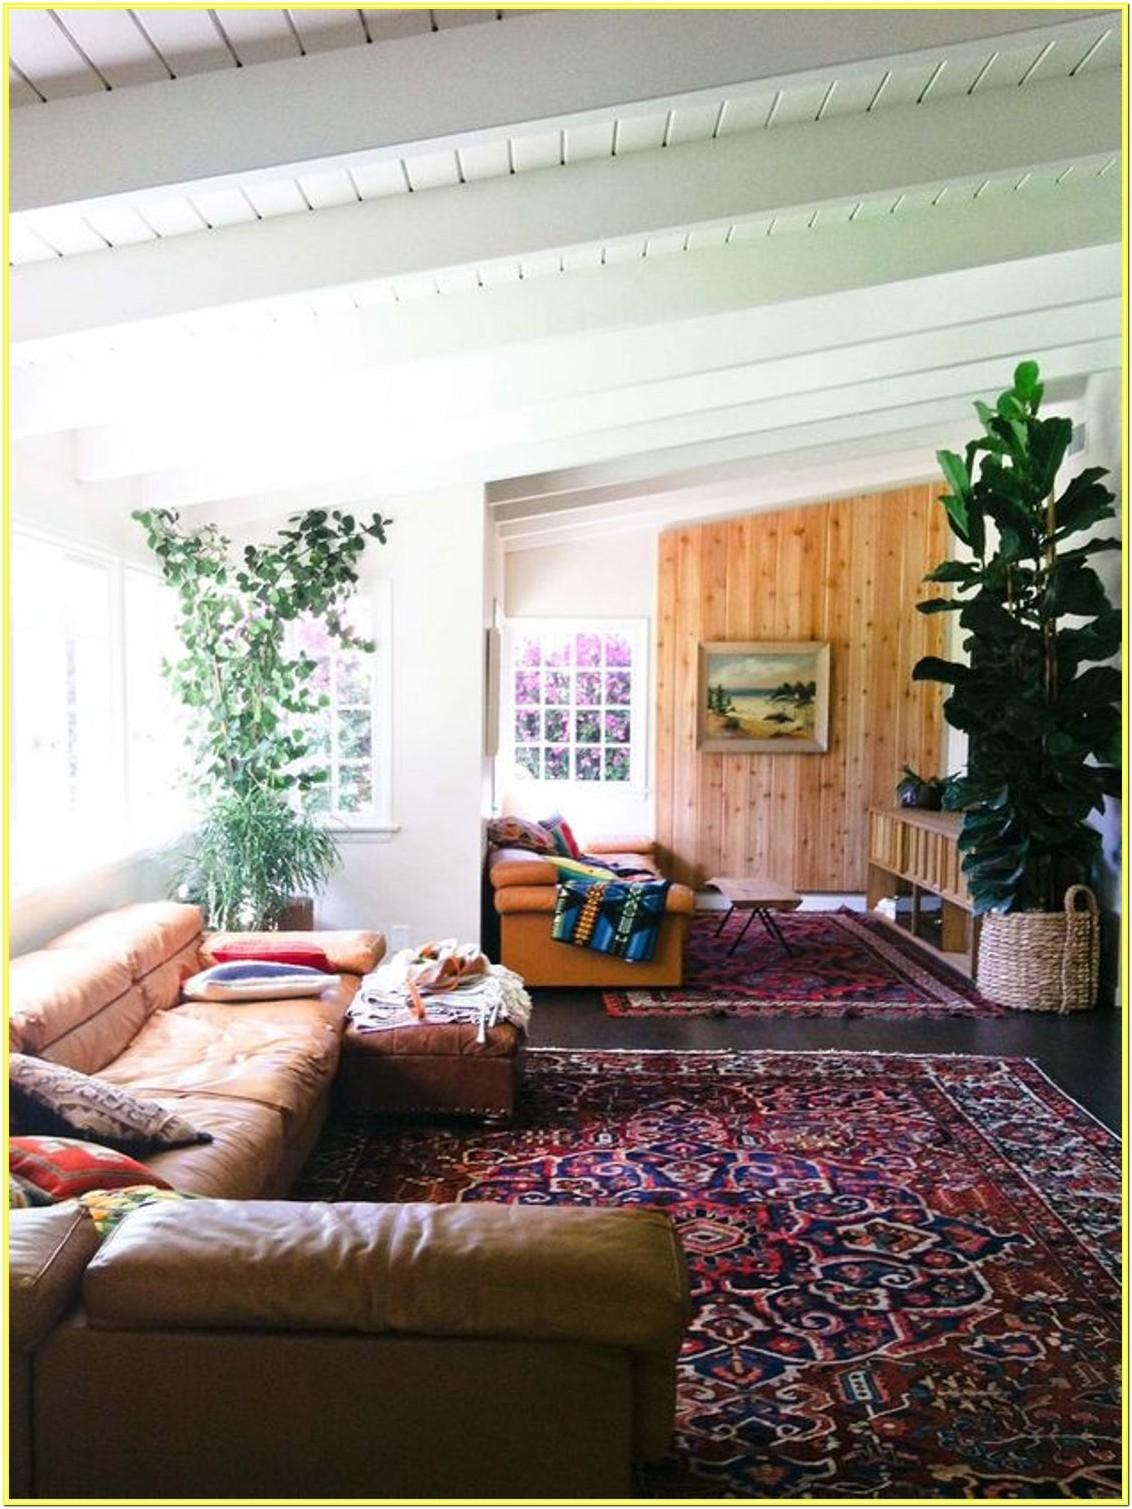 Classy Bohemian Living Room Decor